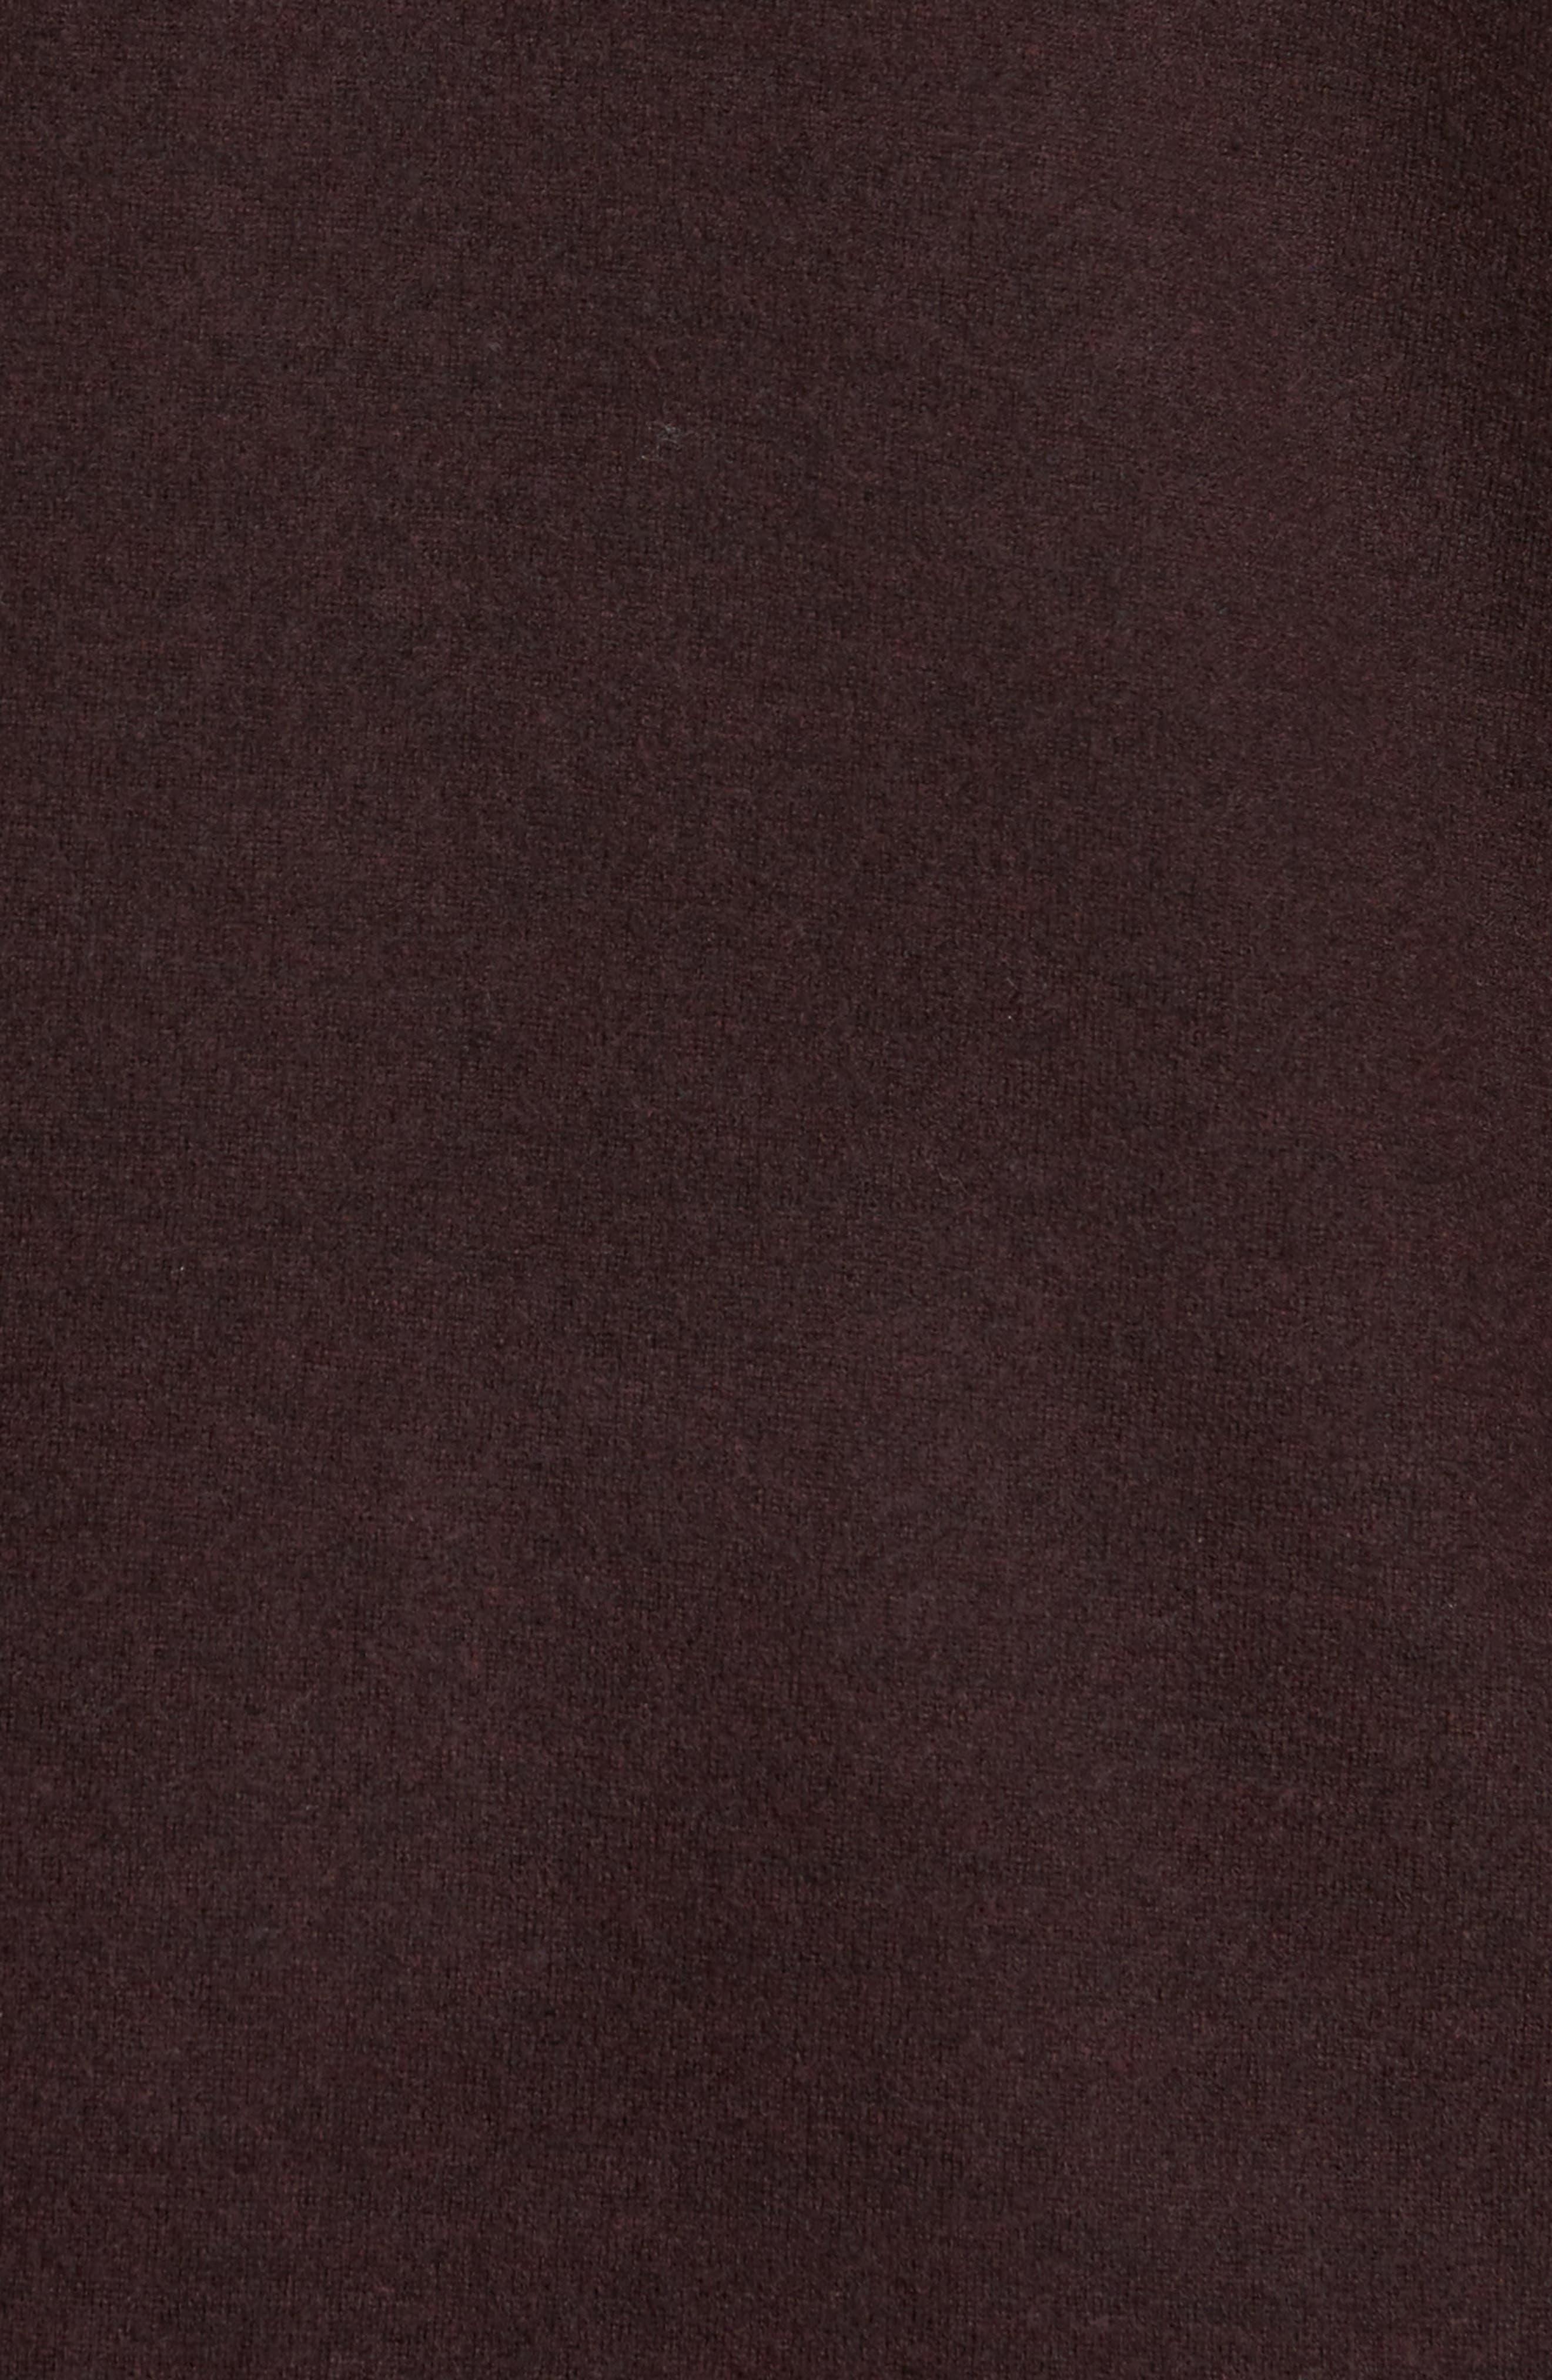 Notch Collar Merino Wool Topper,                             Alternate thumbnail 5, color,                             Clove